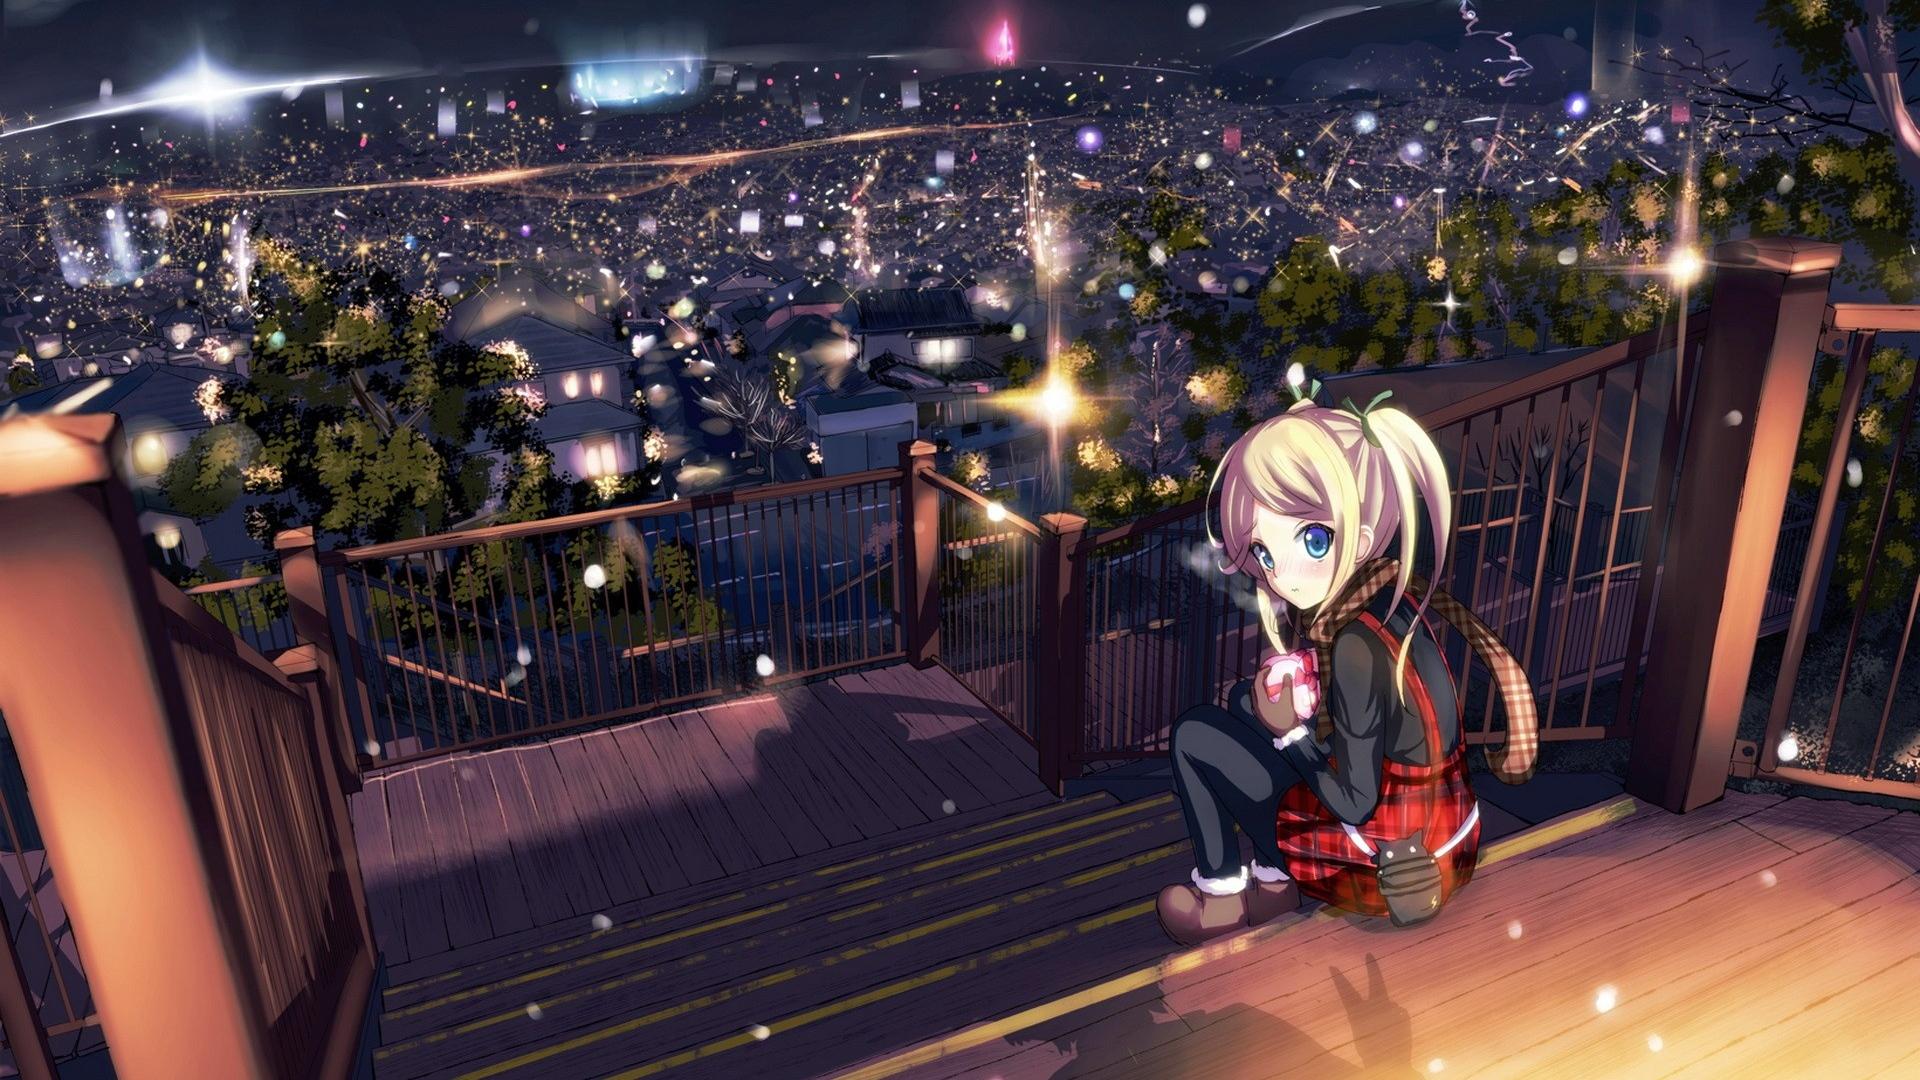 Lonely Girl Hd Wallpapers For Mobile Anime Girl Wallpapers Hd Pixelstalk Net